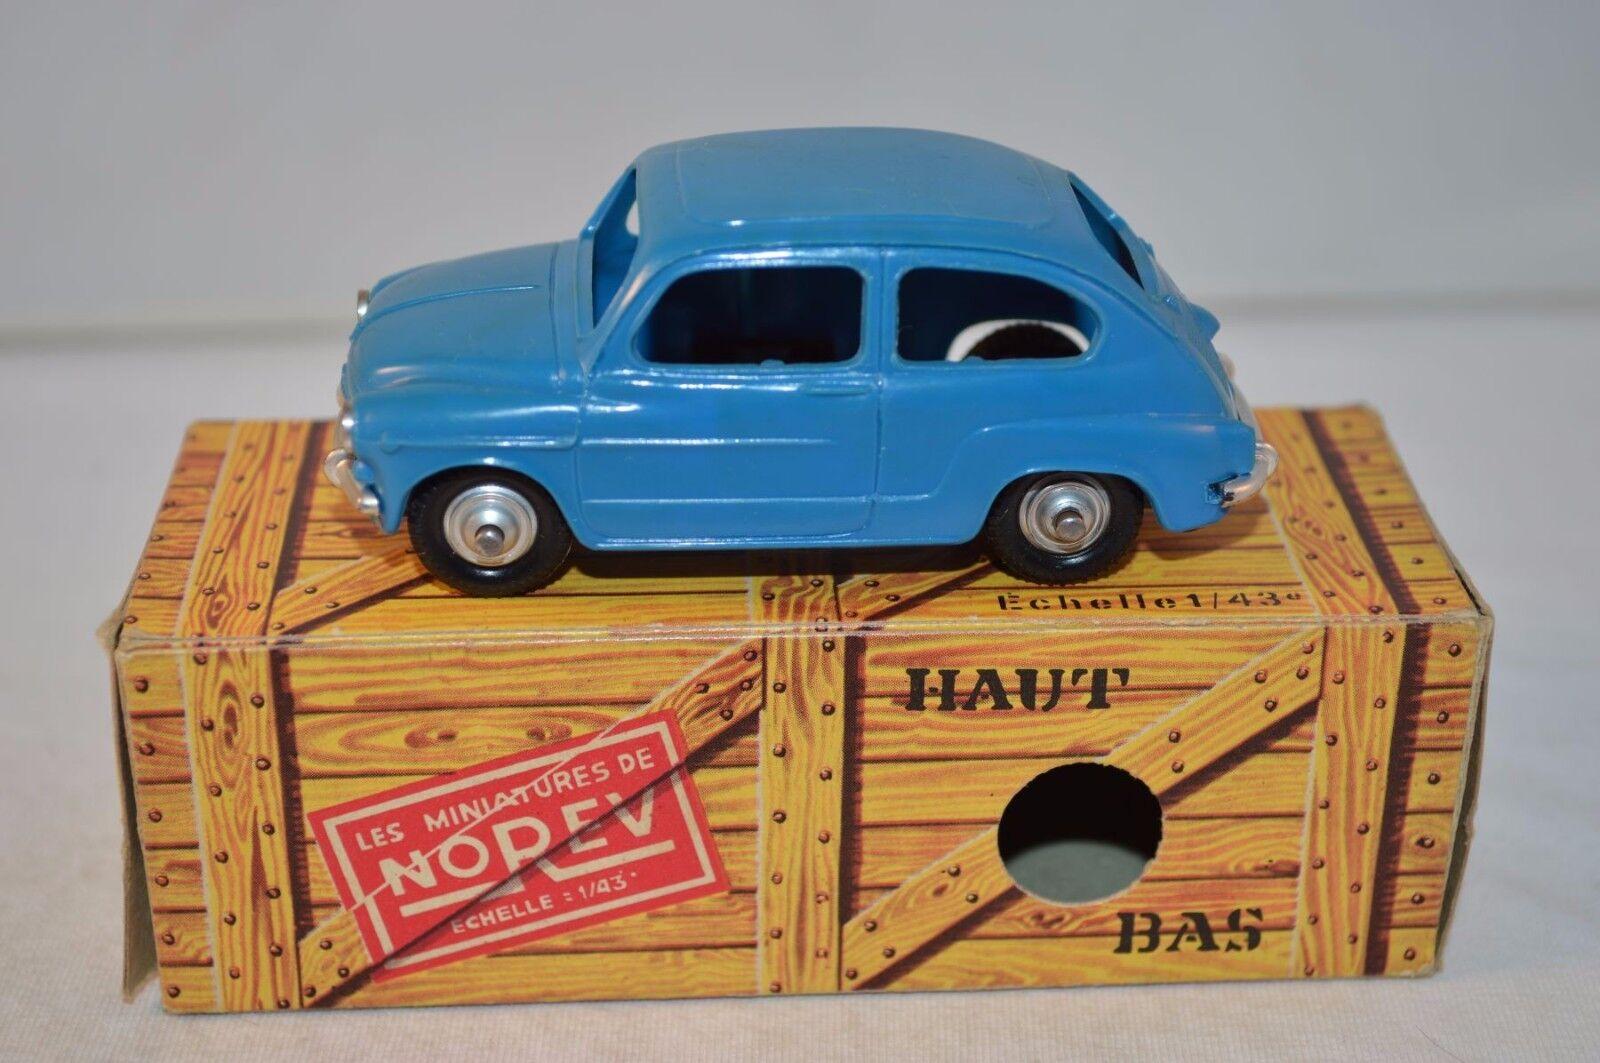 Norev 61 Fiat 600 plastique bleu perfect mint in box superb